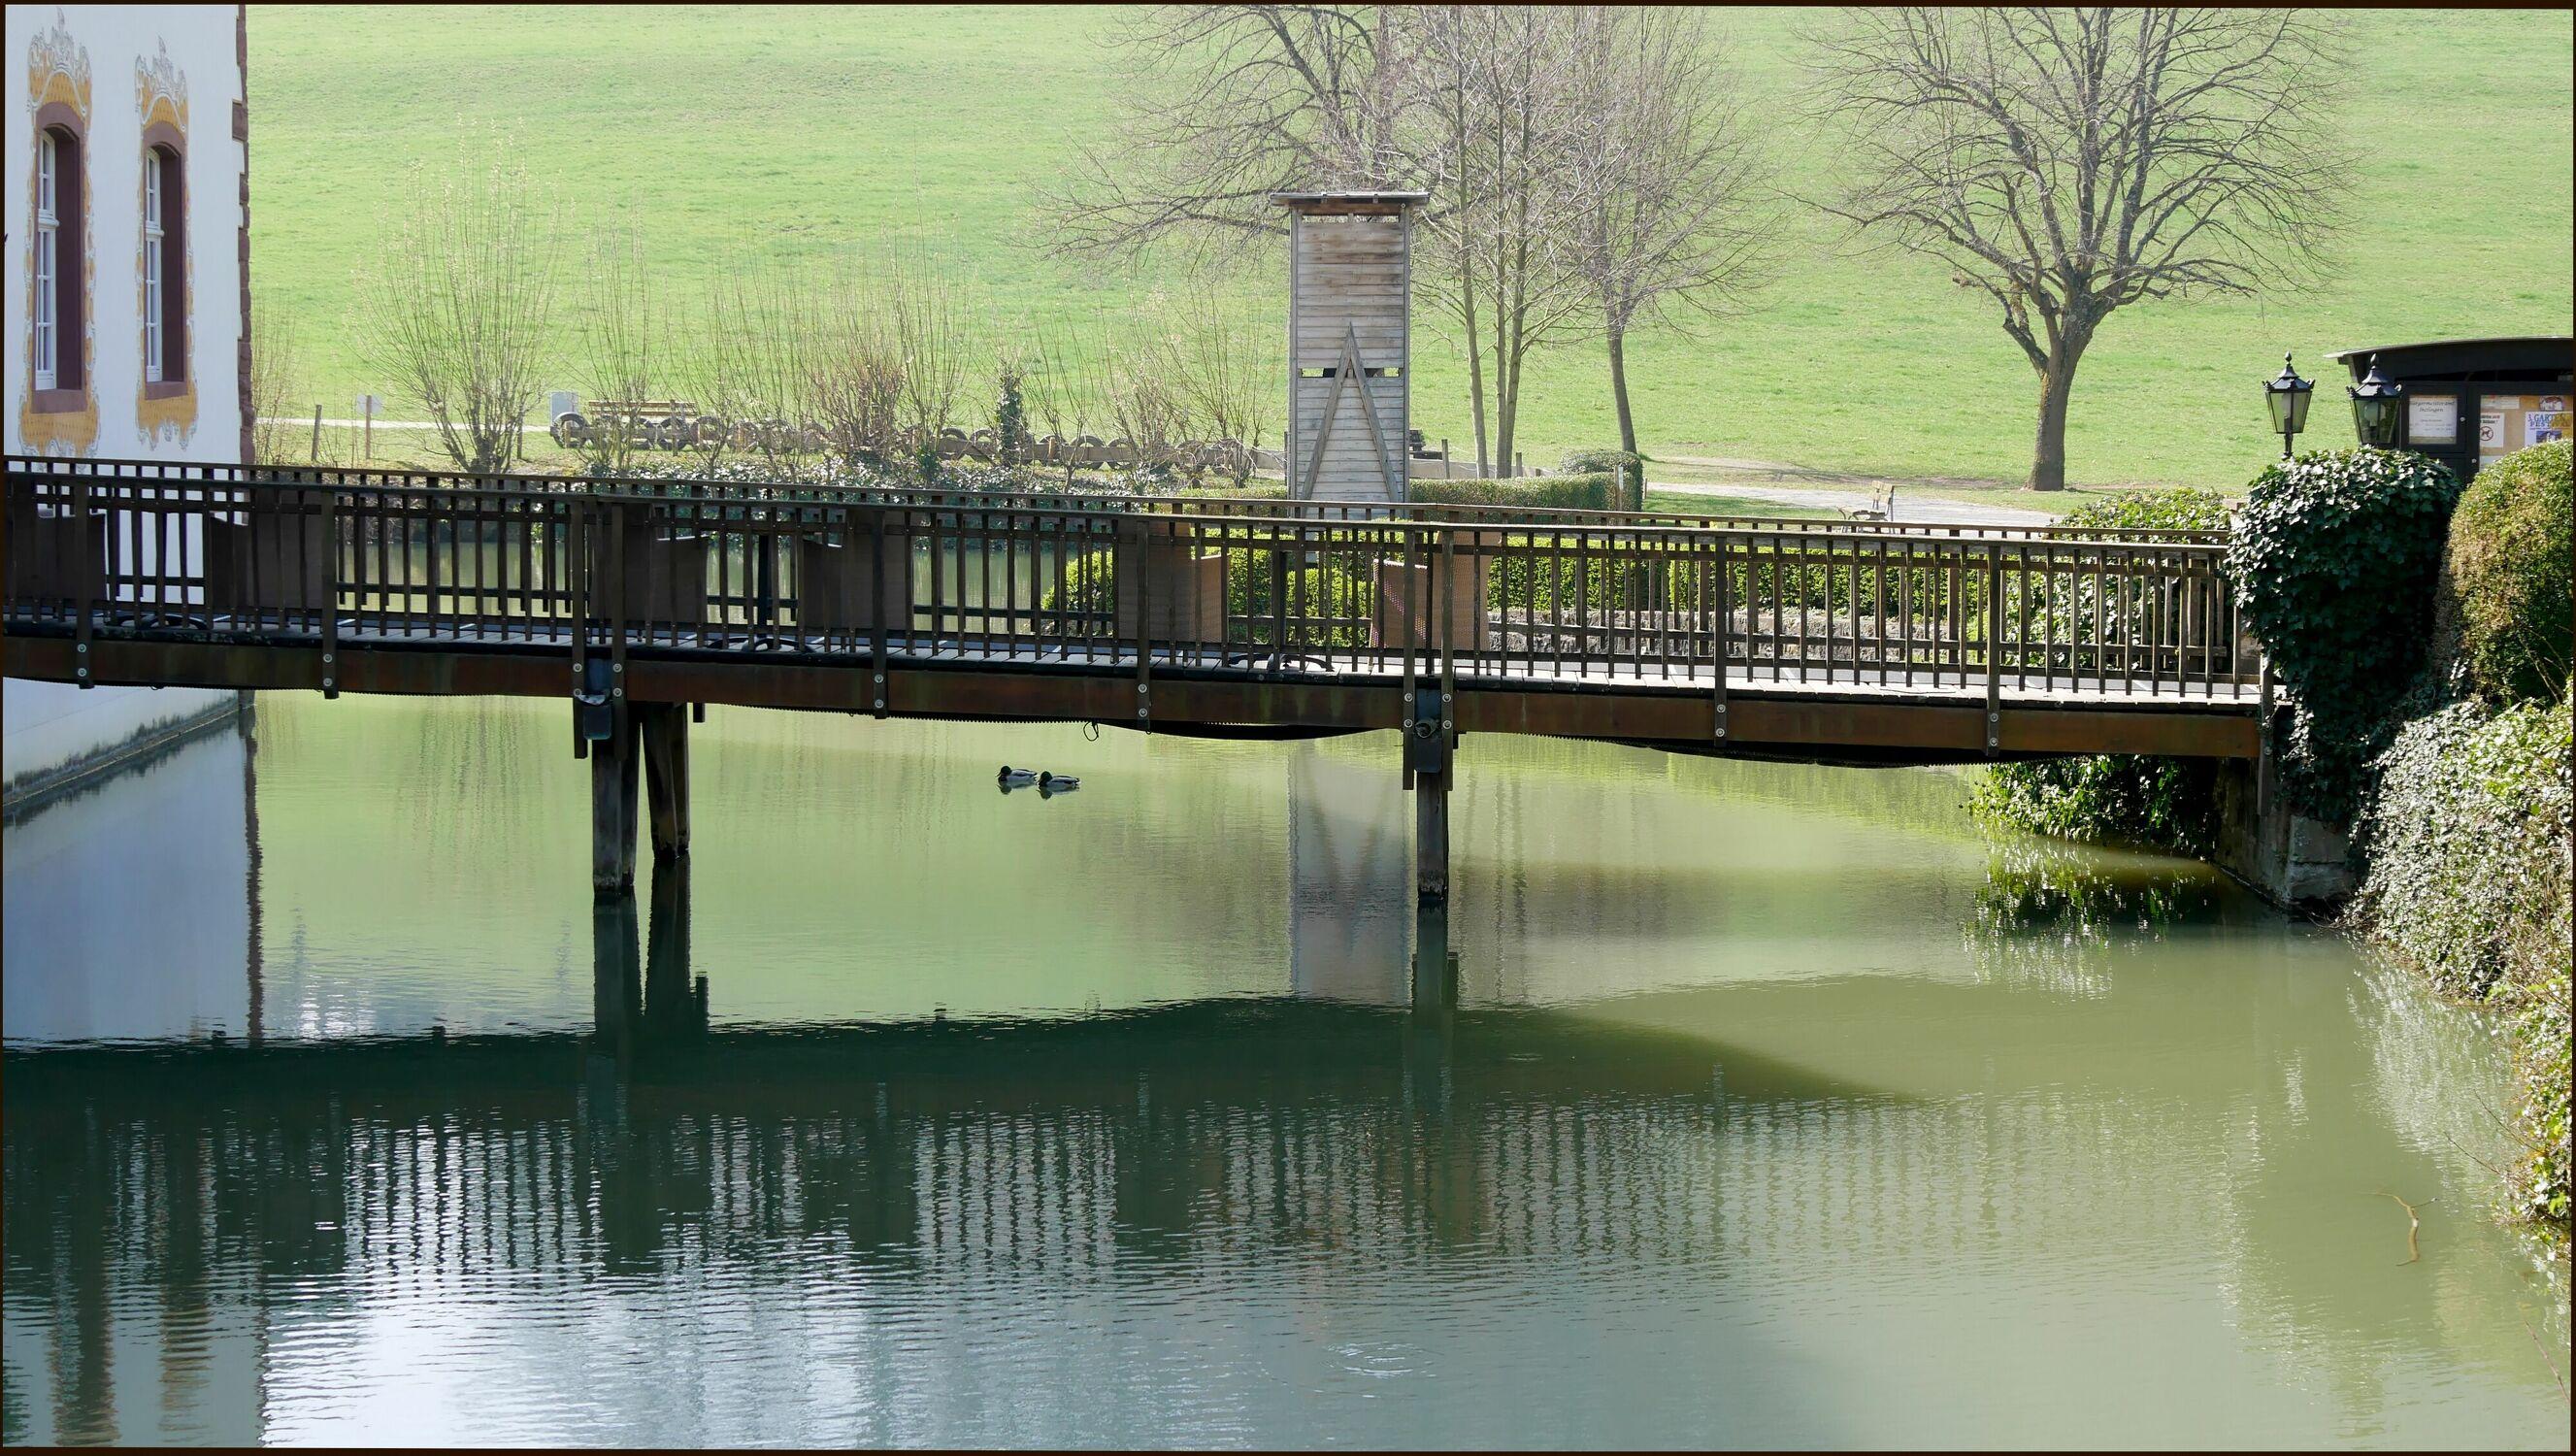 Bild mit Natur, Bäume, Frühling, Holzstruktur, See, Feld, Spiegelungen, Holzbrücke